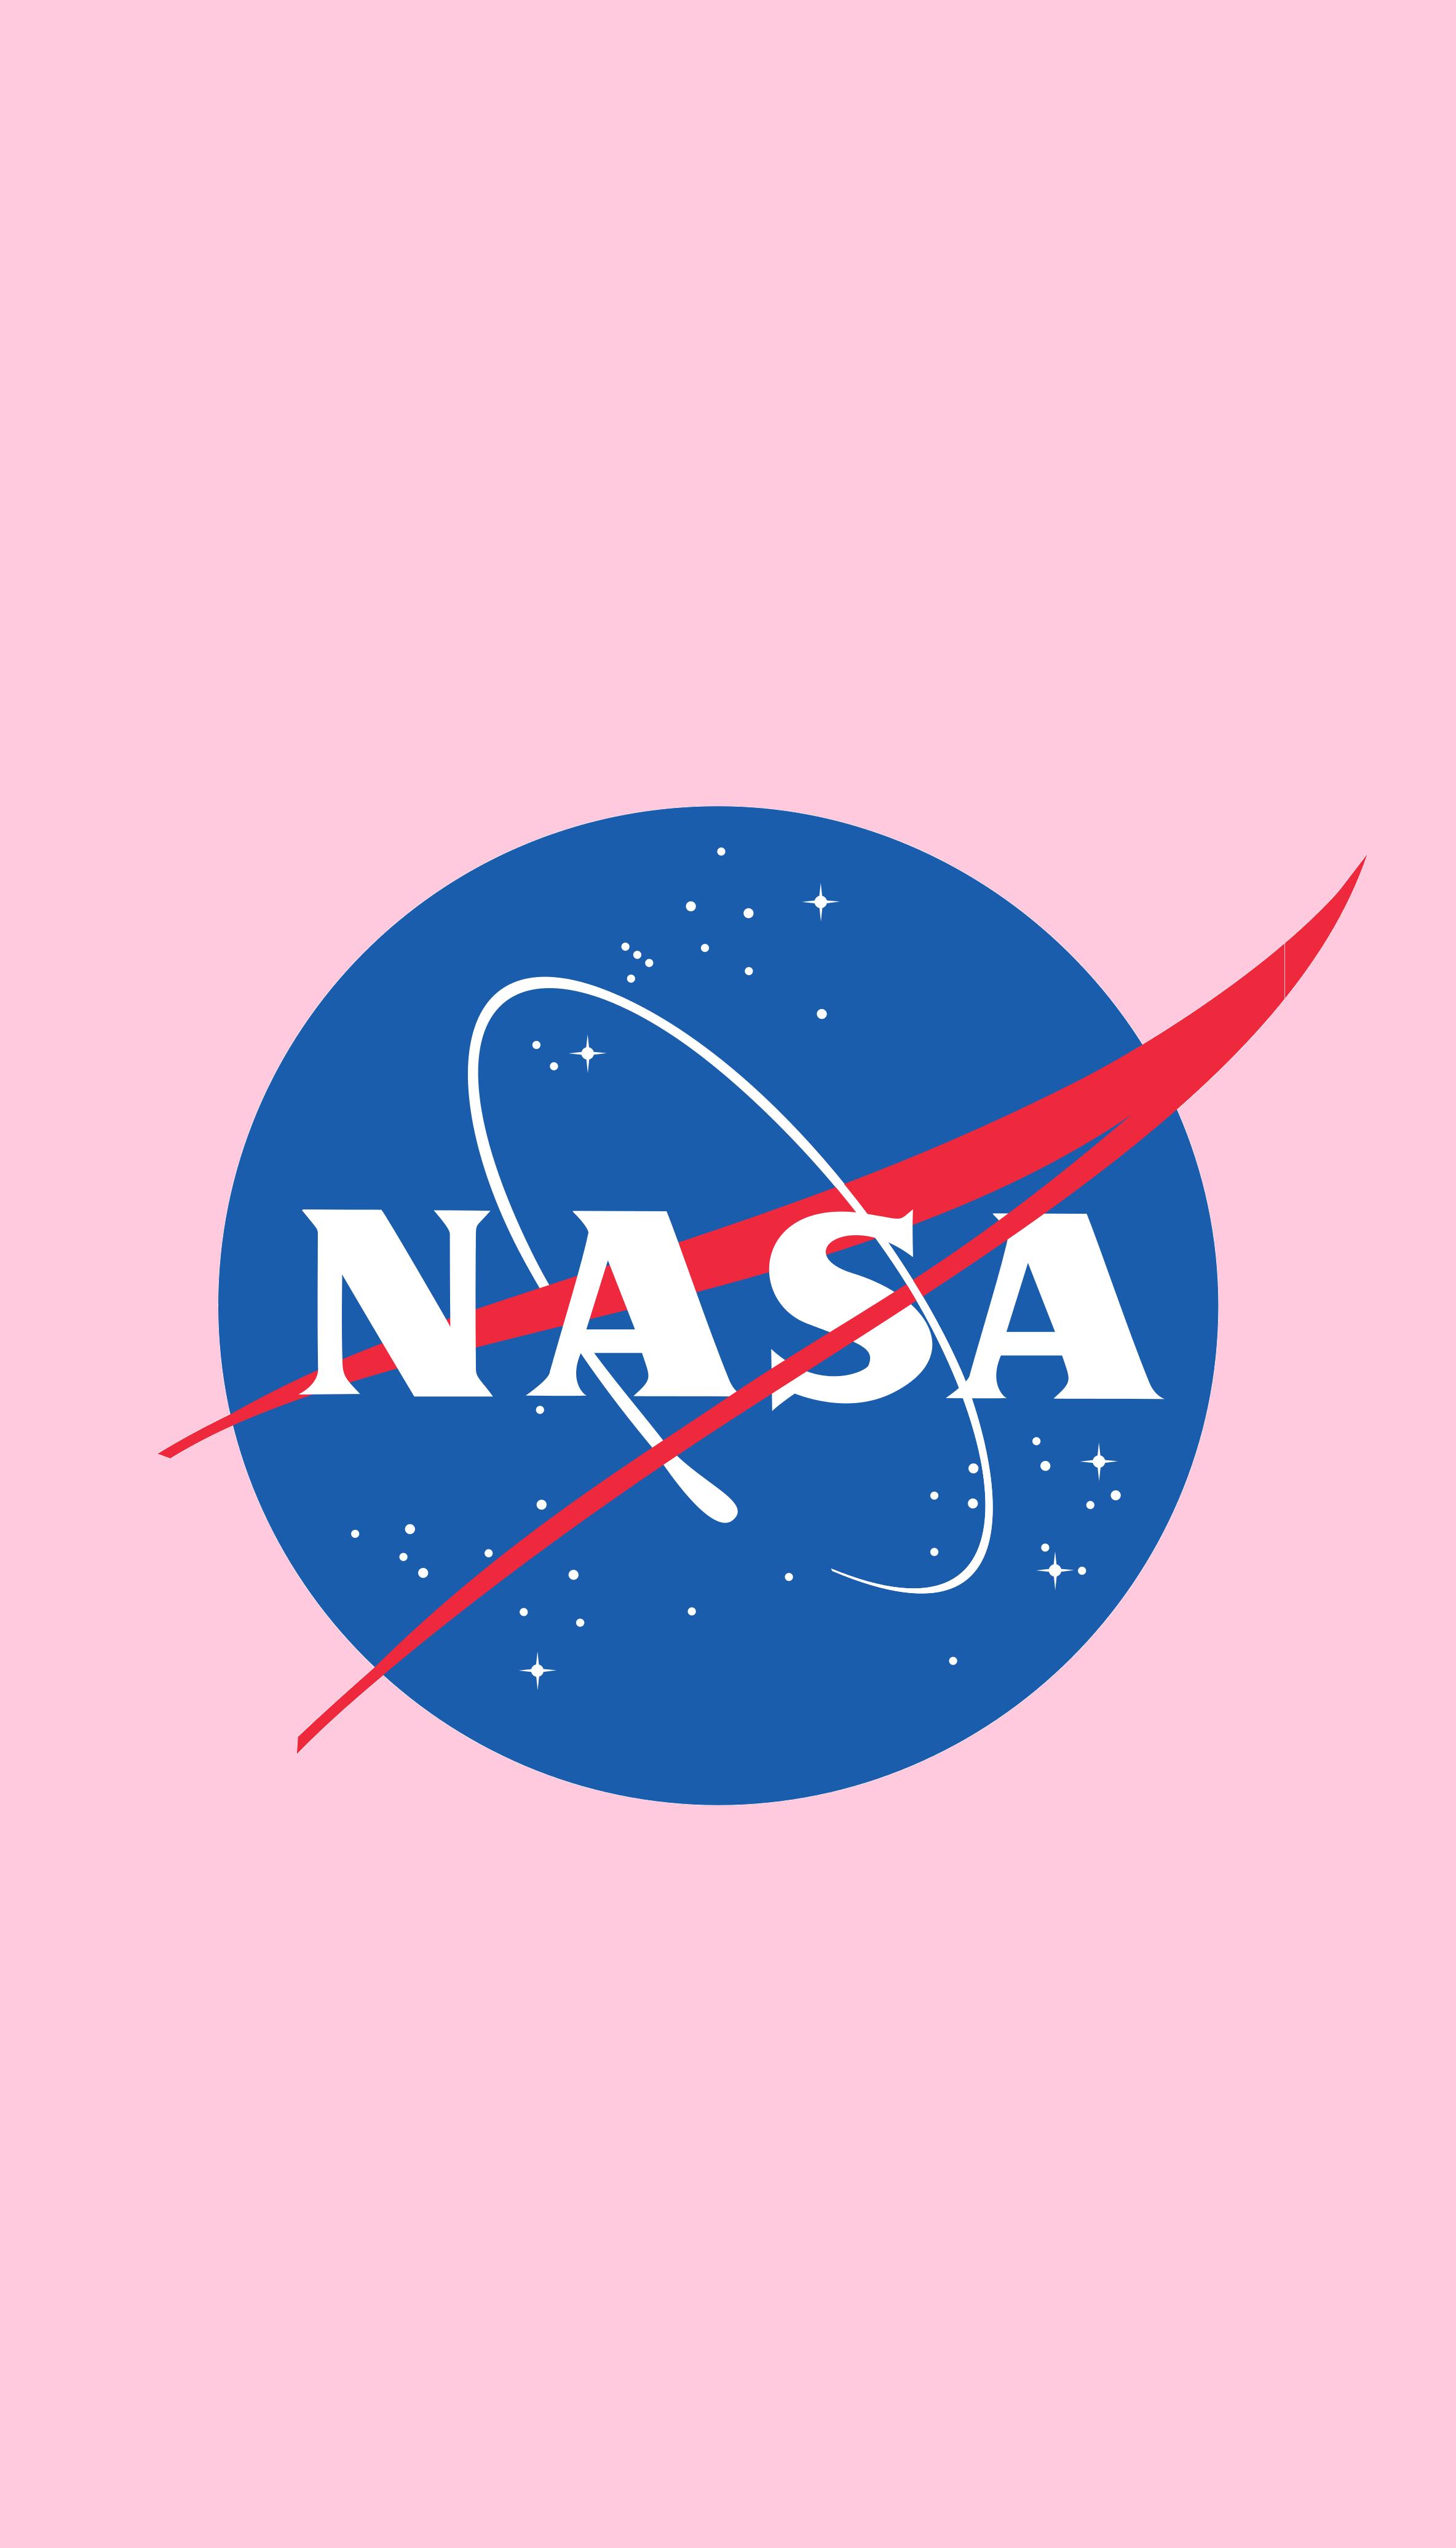 Nasa Logo Iphone Wallpapers Top Free Nasa Logo Iphone